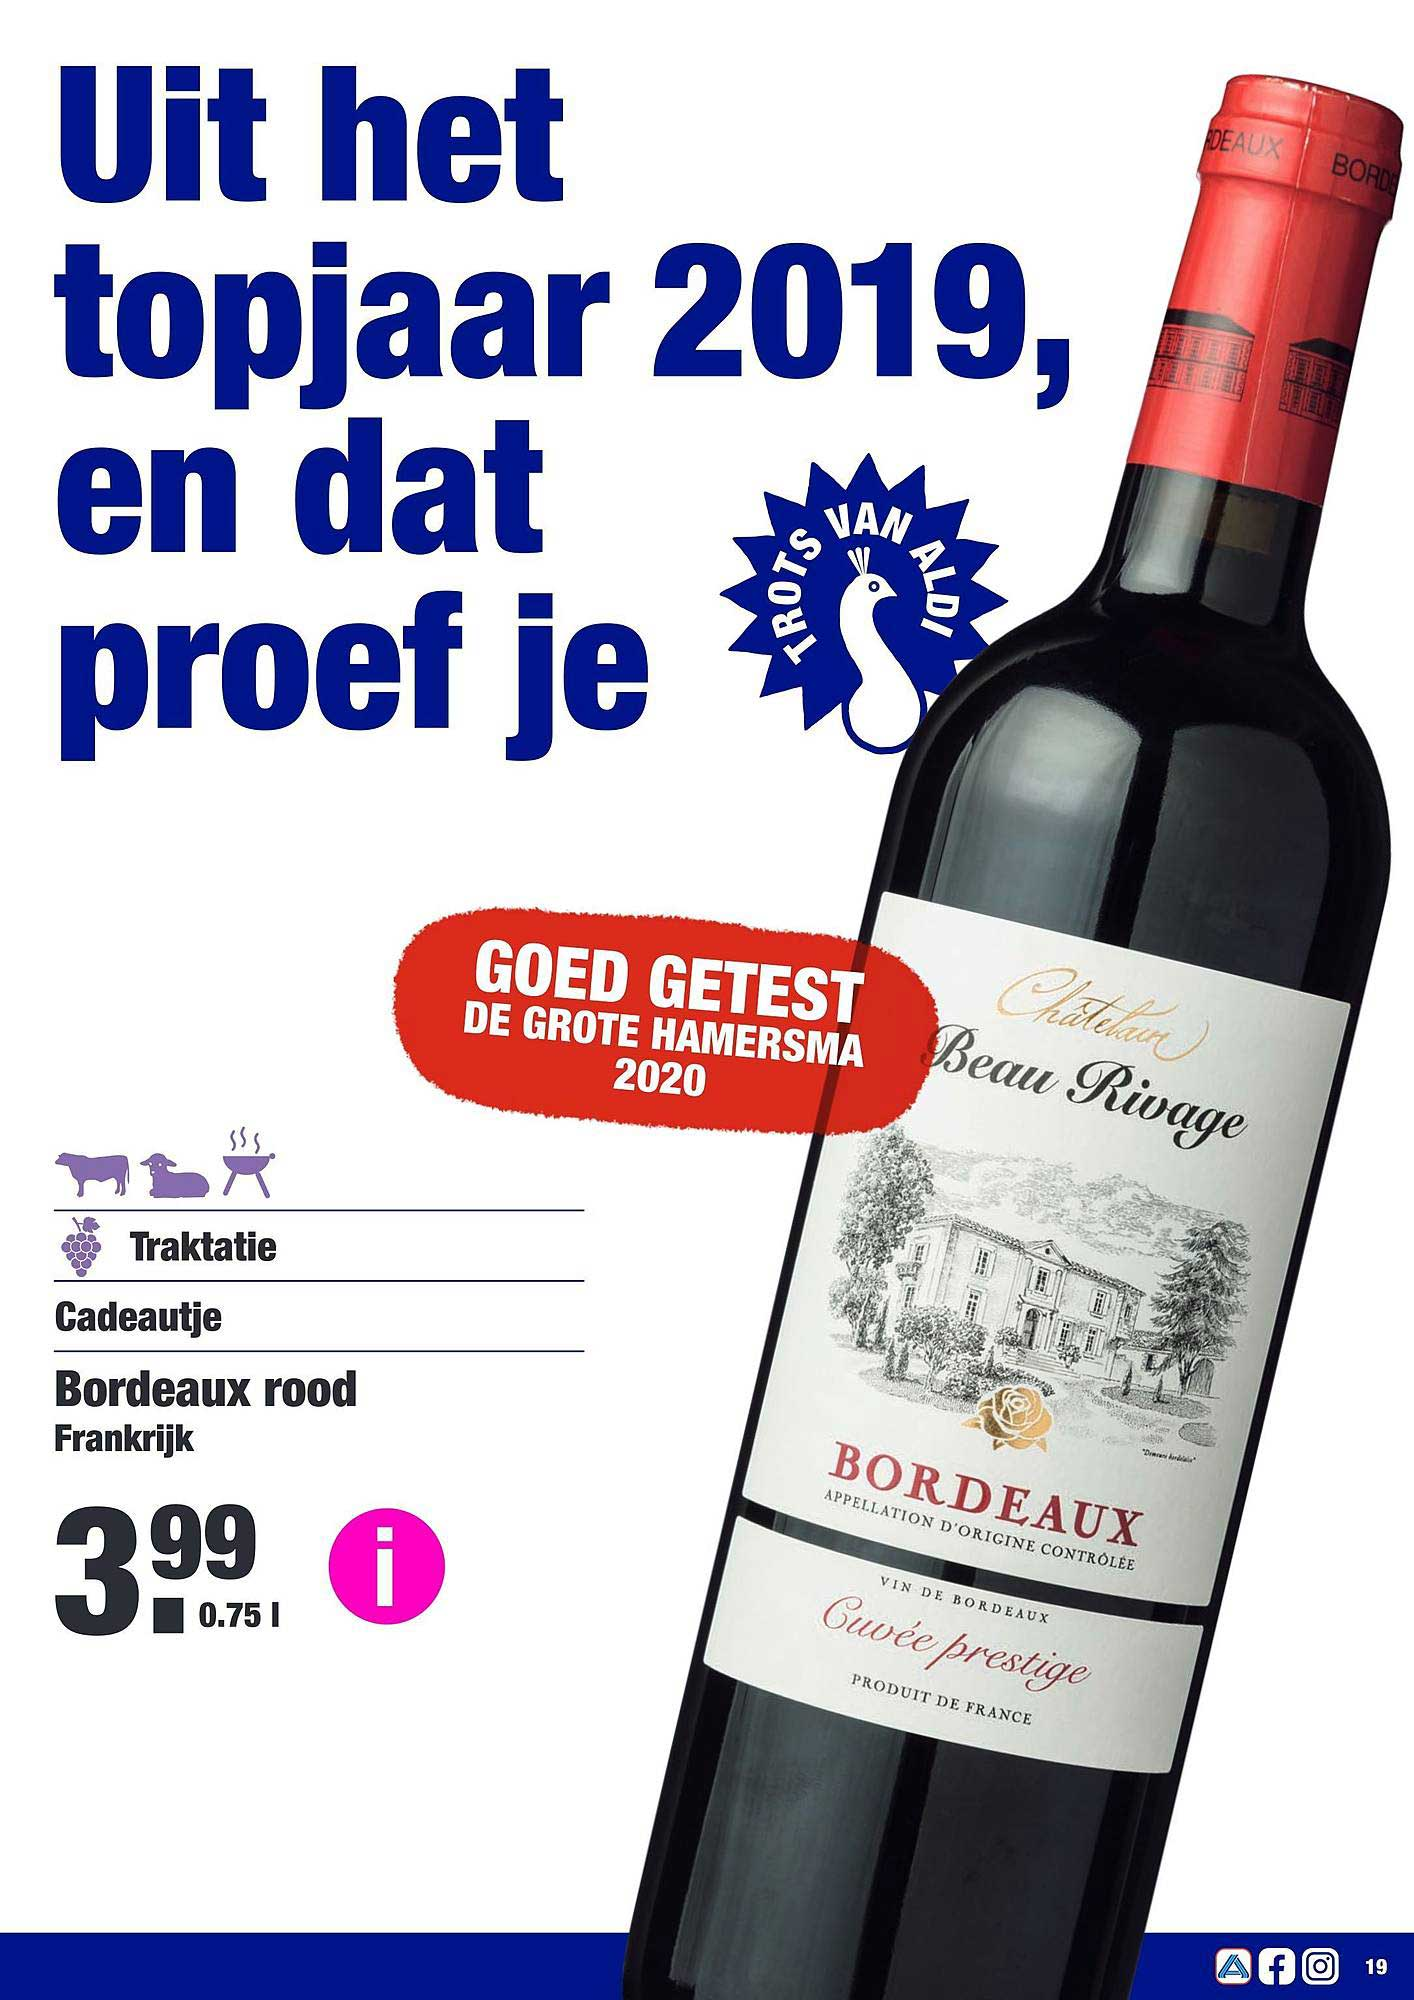 ALDI Bordeaux Rood